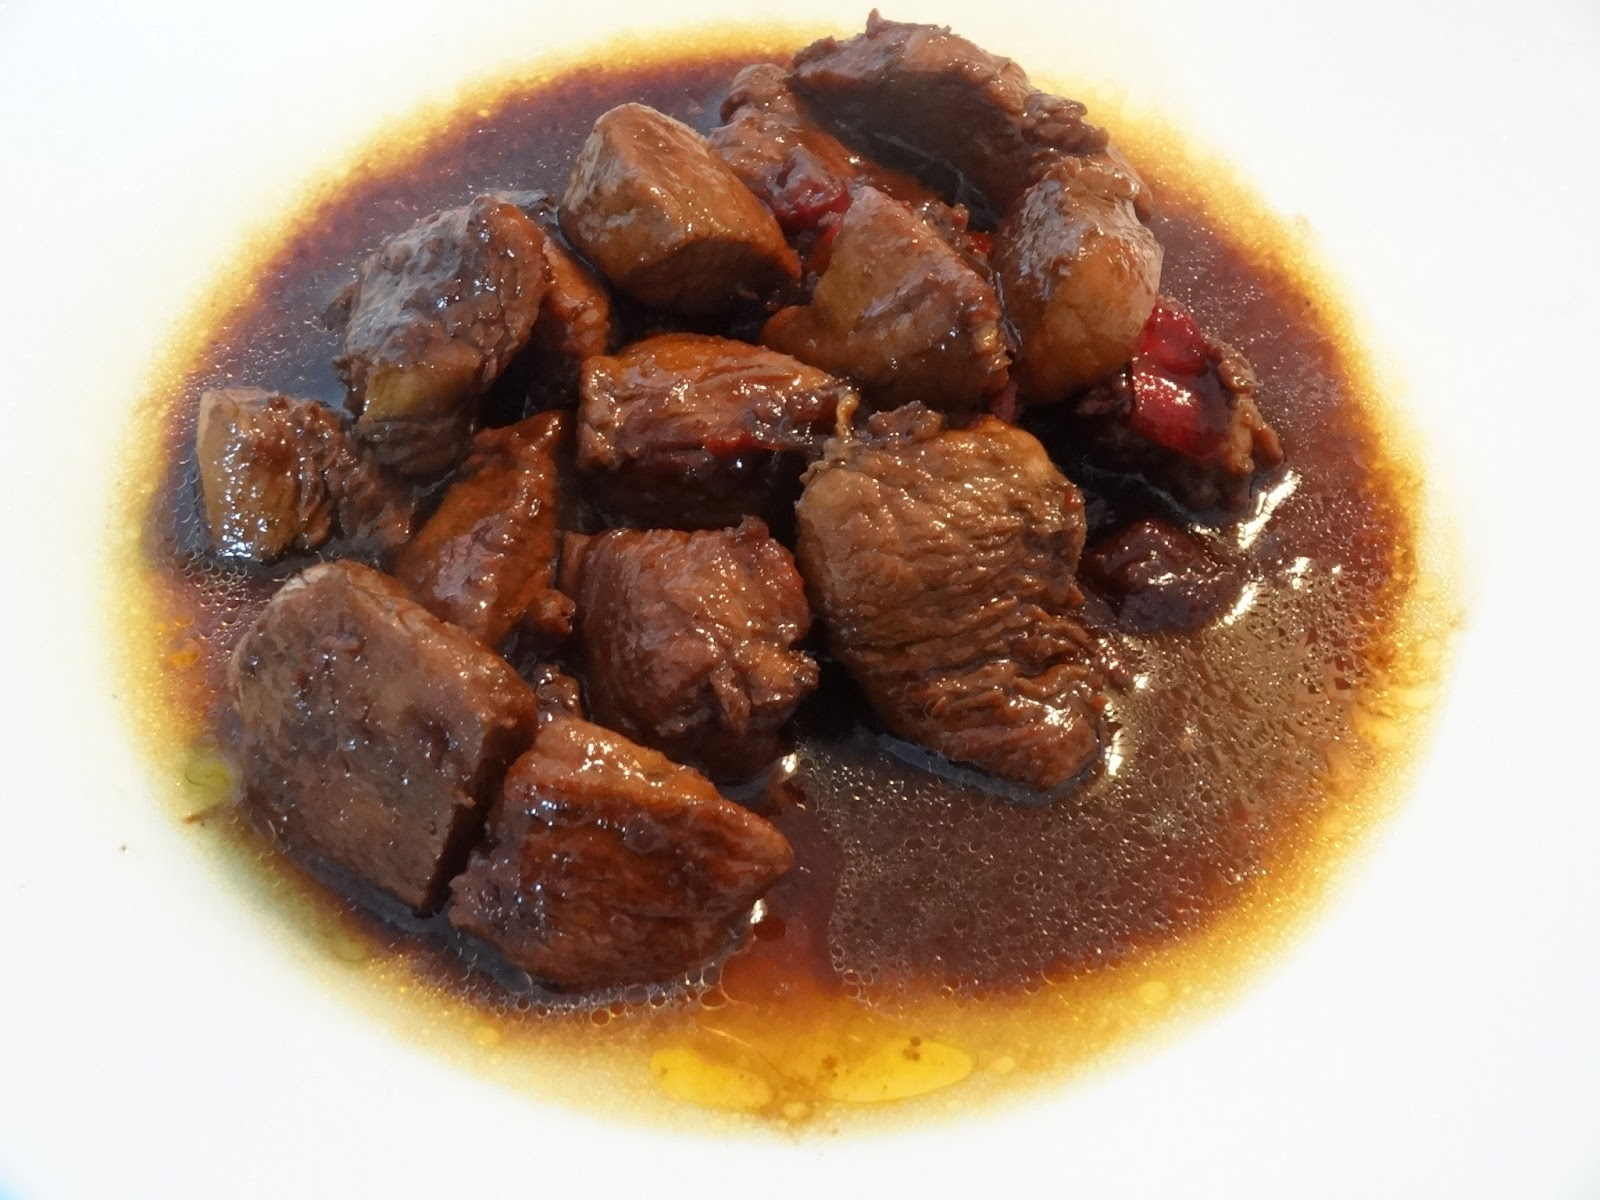 http://1.bp.blogspot.com/-Wnw4PCxTV88/UaPGOVjF9EI/AAAAAAAAHhE/6muW2obnufU/s1600/surinaams+eten,suriname,javaans-surinaams,surinaamse+recepten,javaans-surinaams,surinaamse+kip,javaanse+kip,indisch+eten,indonesische+recepten,kip+met+ketjap,ajam+ketjap.JPG